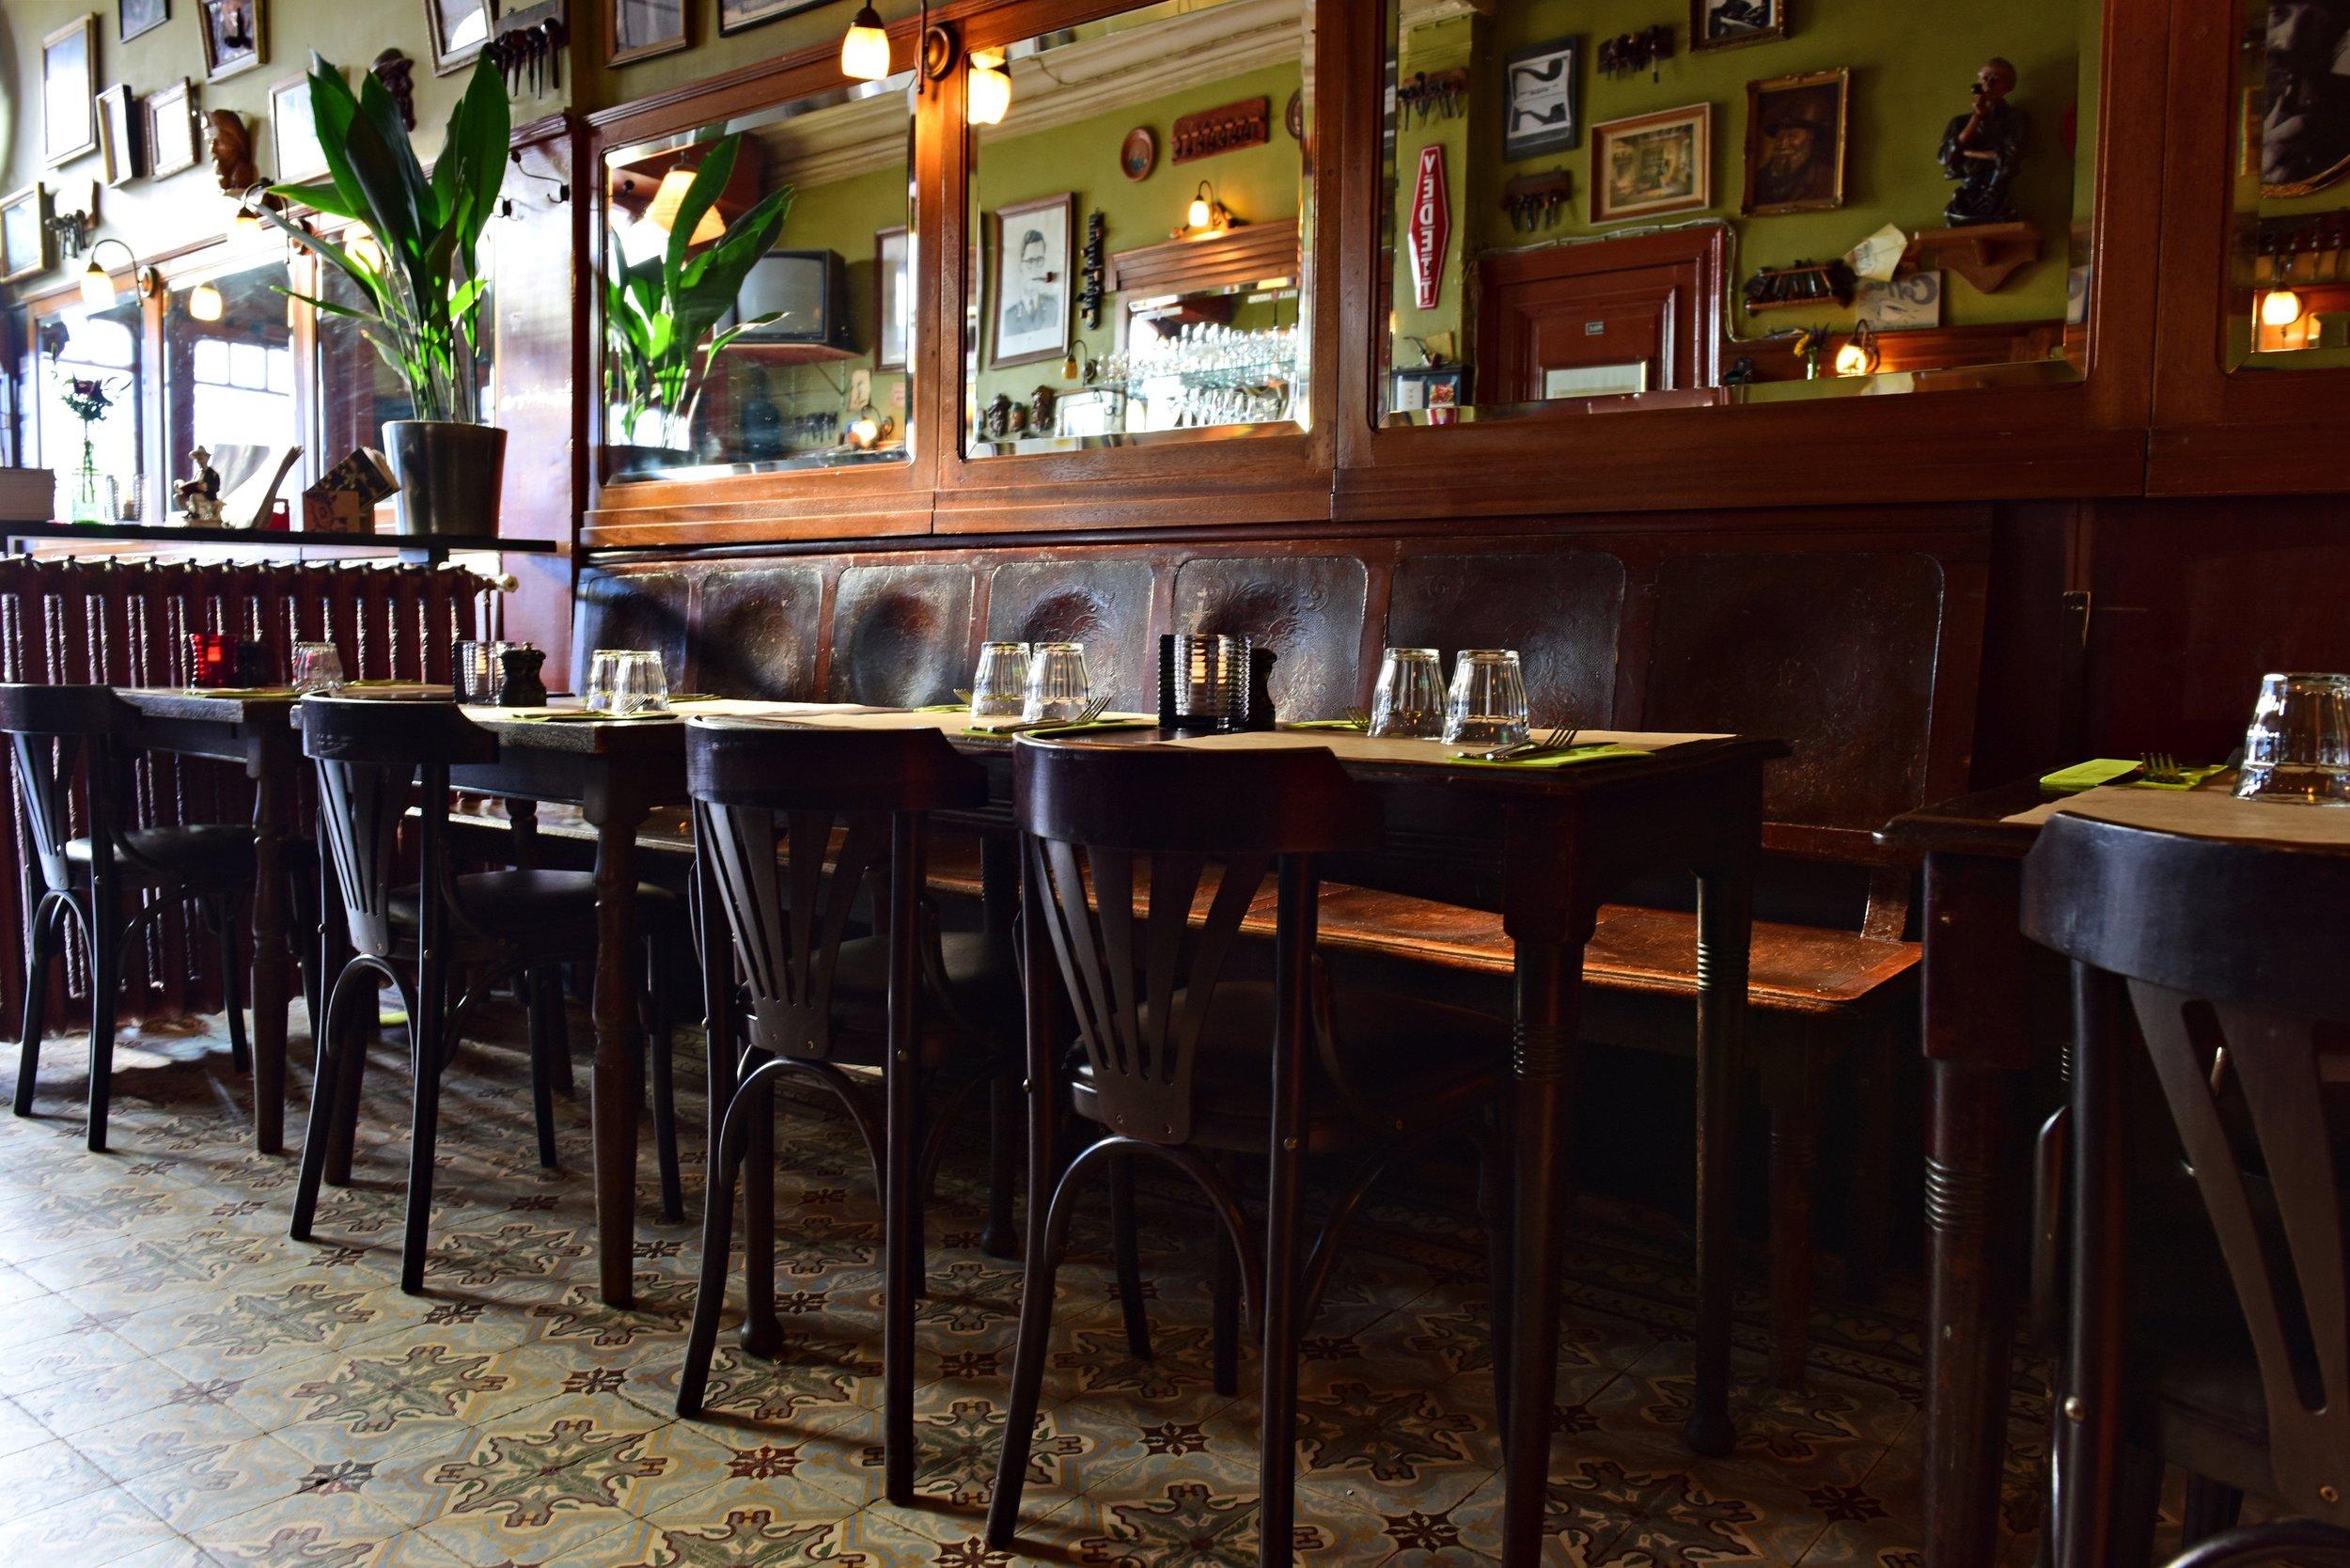 2 la pipe d anvers antwerpen brasserie antwerp best restaurant tablefever.jpg